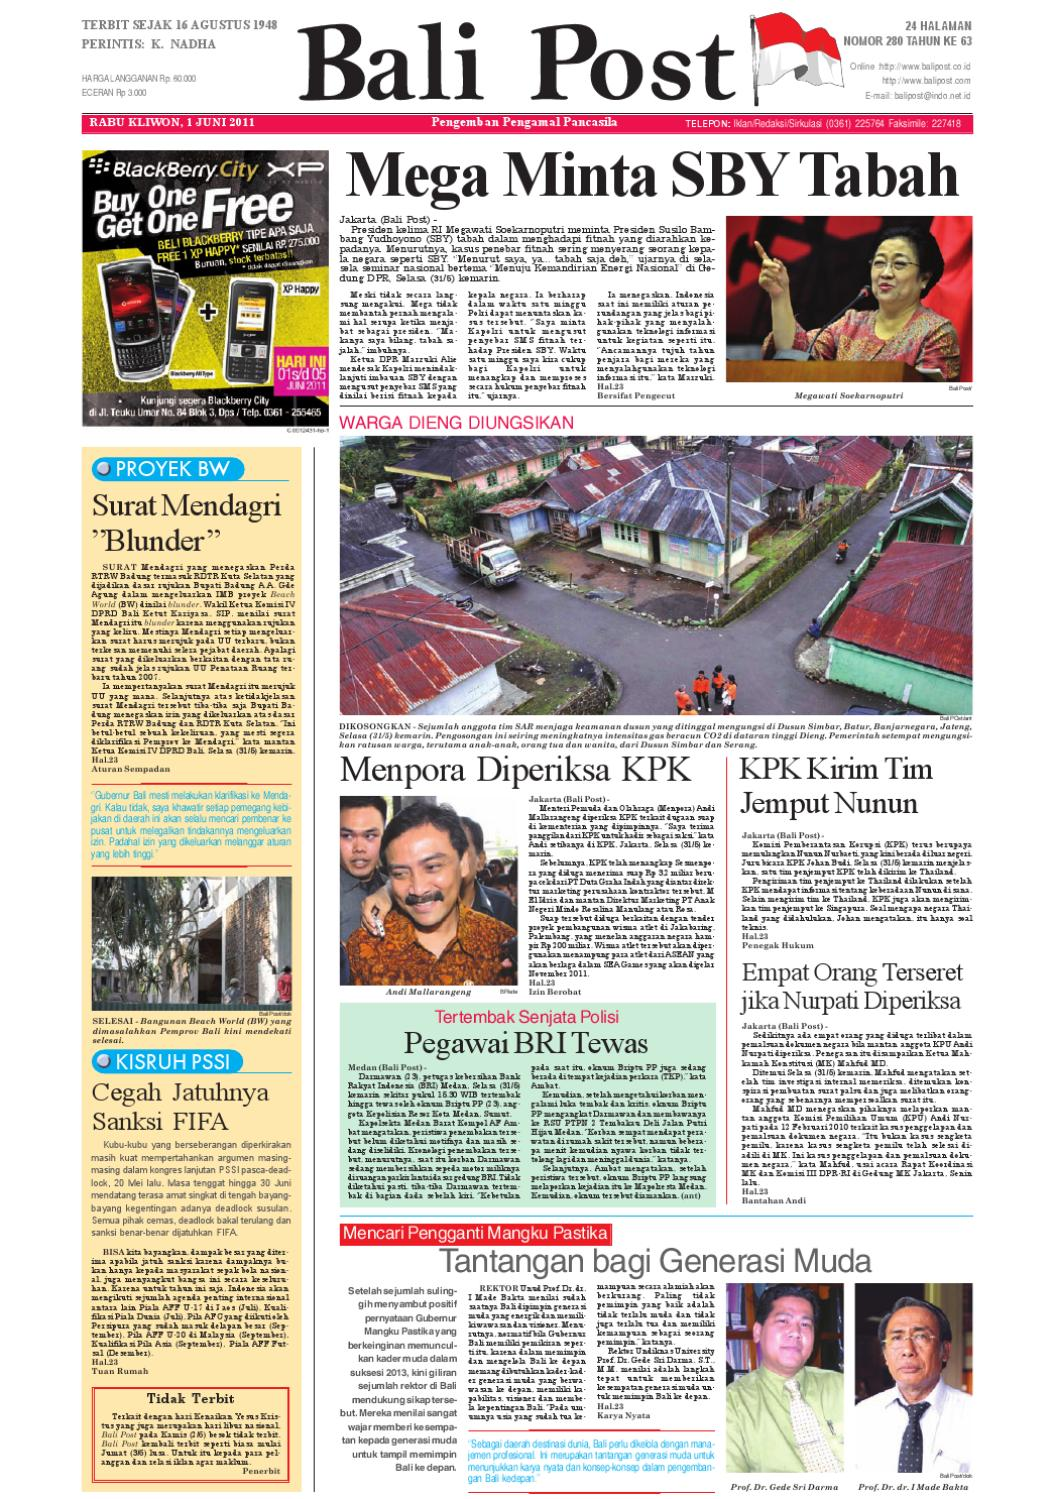 Edisi 30 Juni 2011 Balipostcom By E Paper Kmb Issuu Rejeki Anak Soleh 3 Agip 4t Super 1l 1